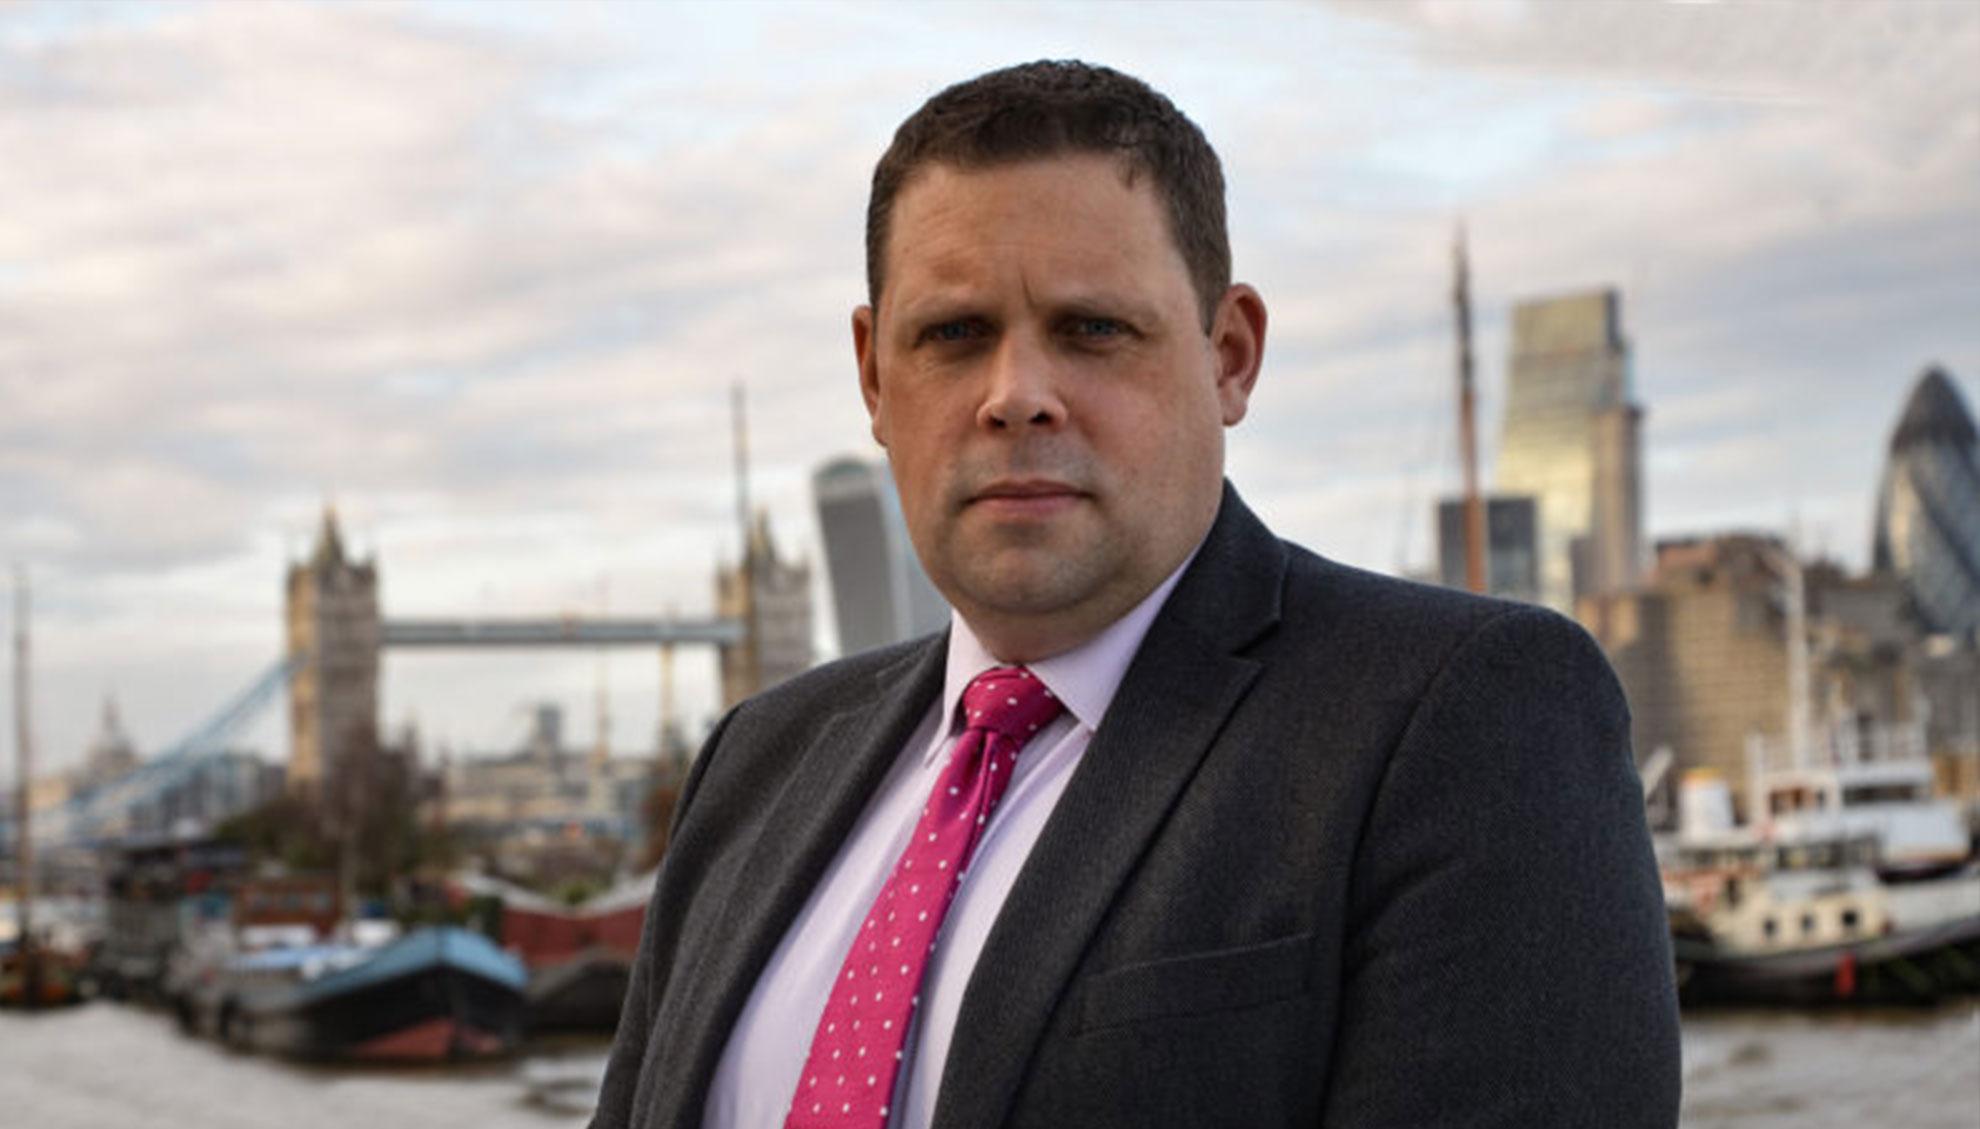 Adrian Mansfield